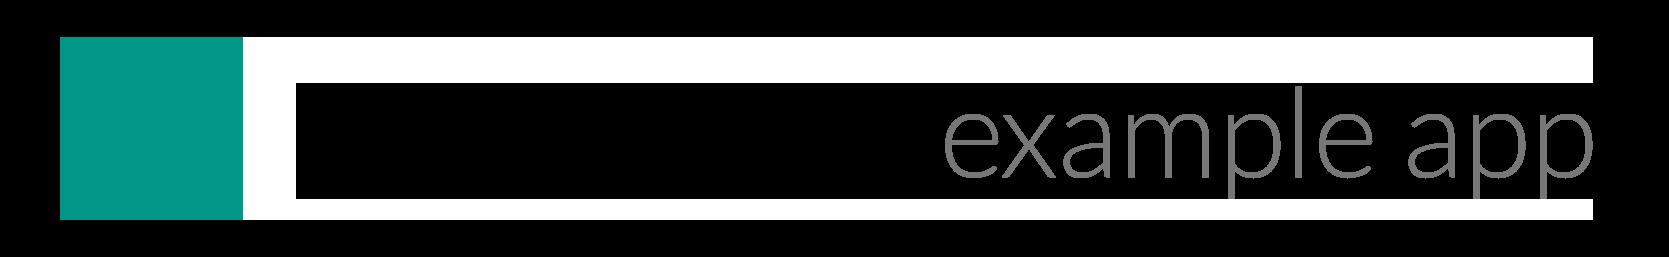 ./.github/assets/logo.png